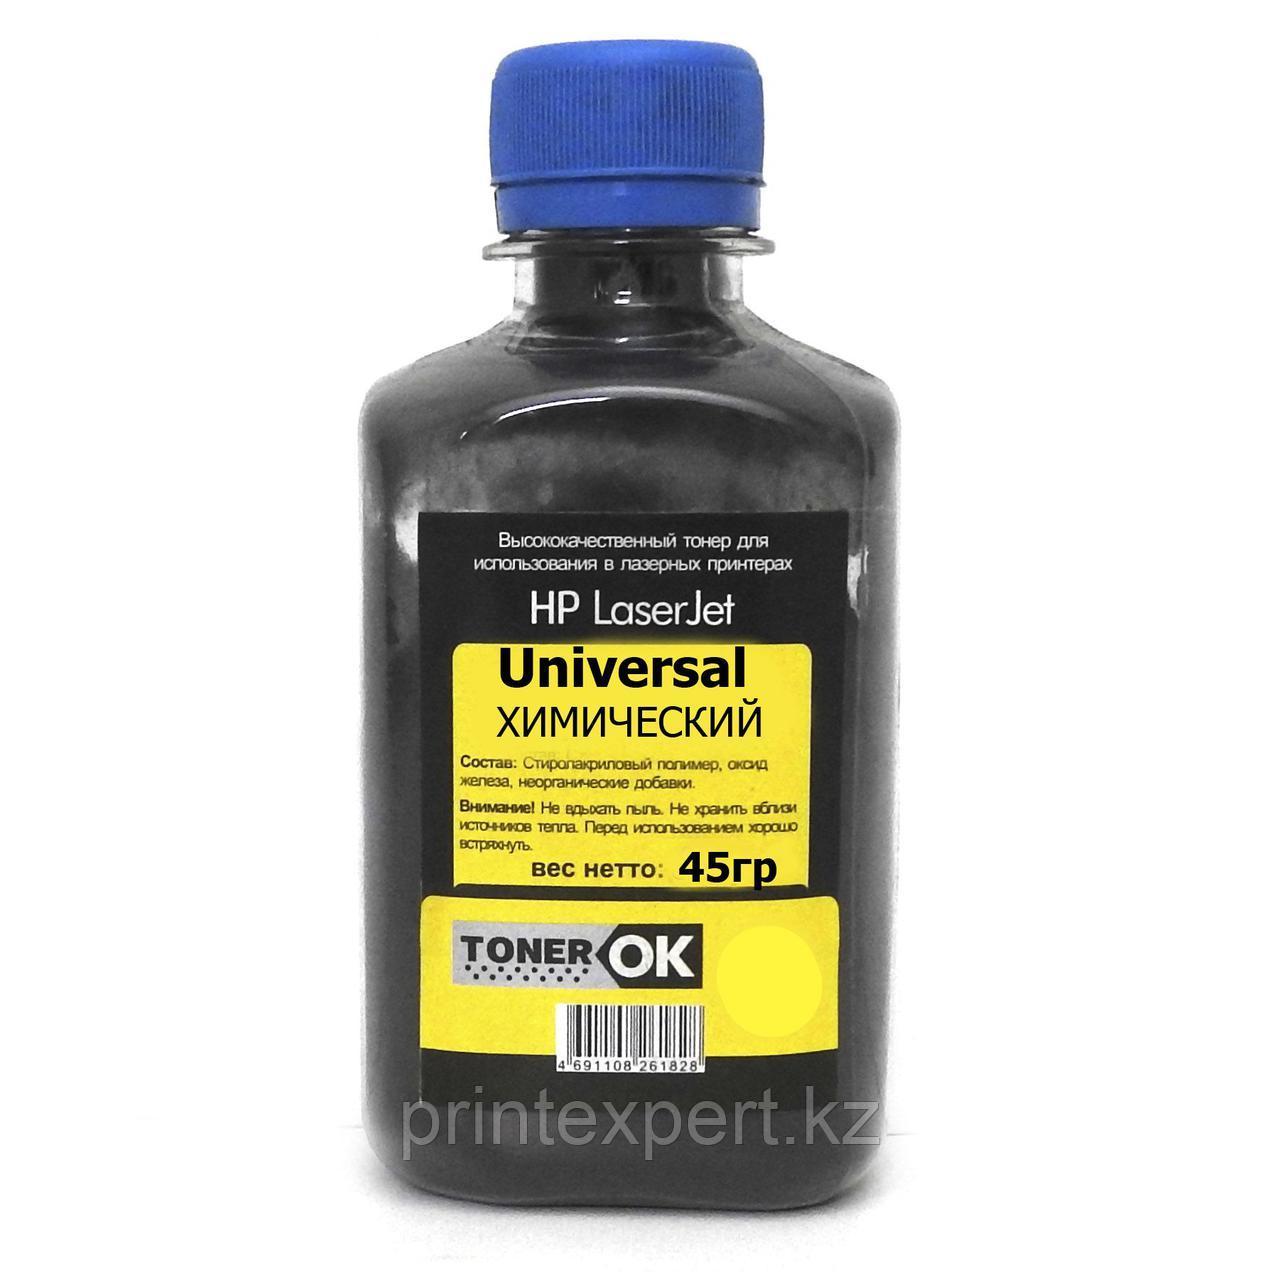 Тонер Toner OK для HP CLJ Universal ХИМИЧЕСКИЙ Yellow (45гр)